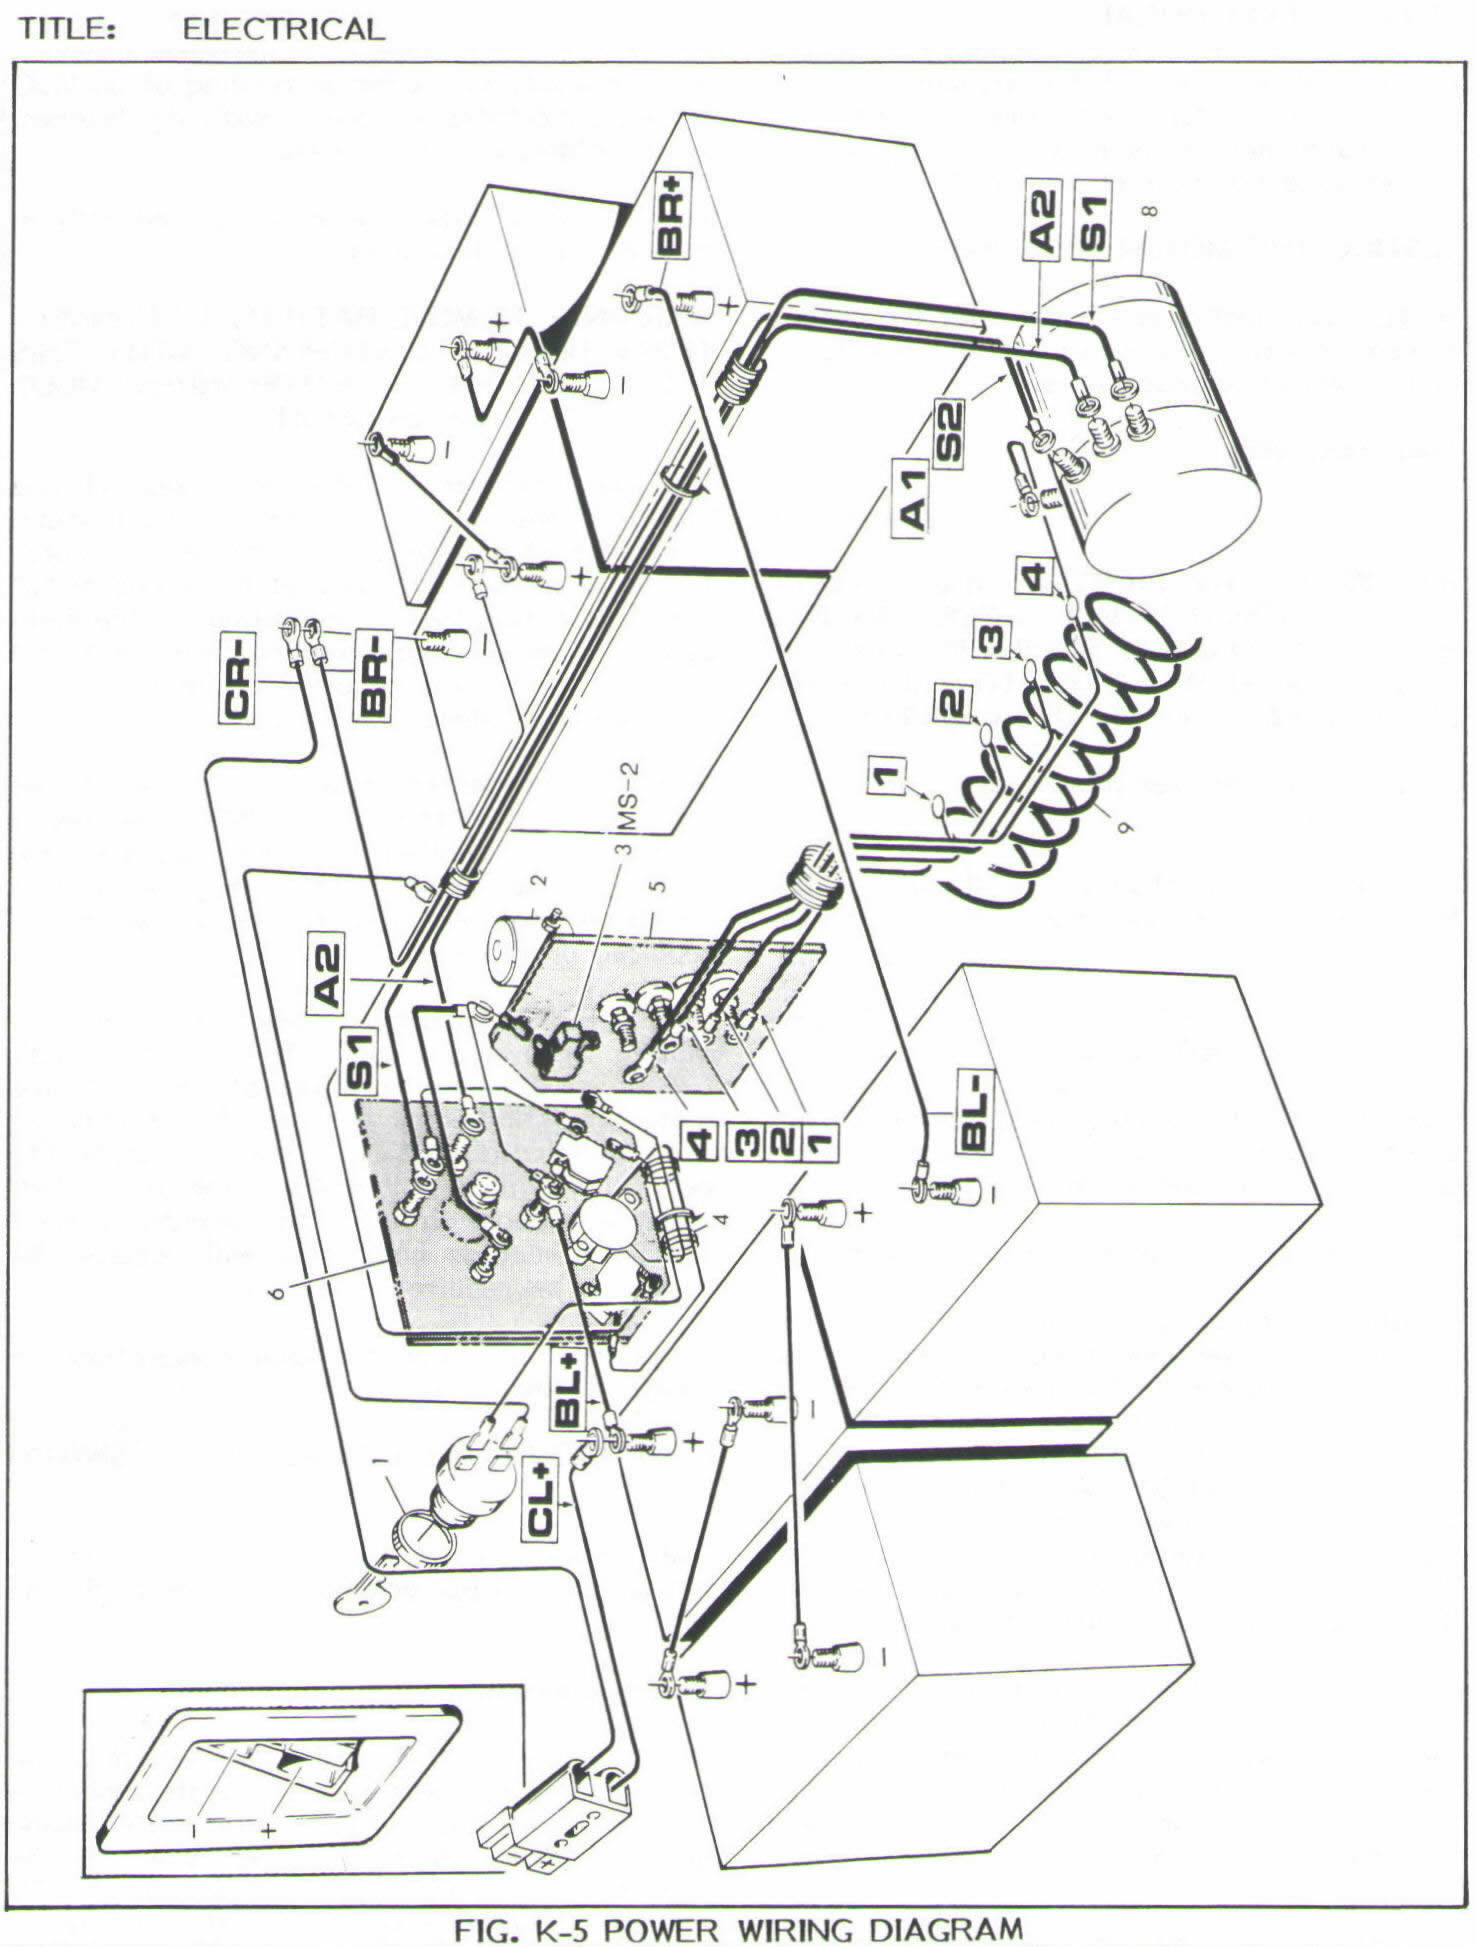 Diagram 1999 Ez Go Wiring Diagram Full Version Hd Quality Wiring Diagram Diagramharshi Piandelvoglio It